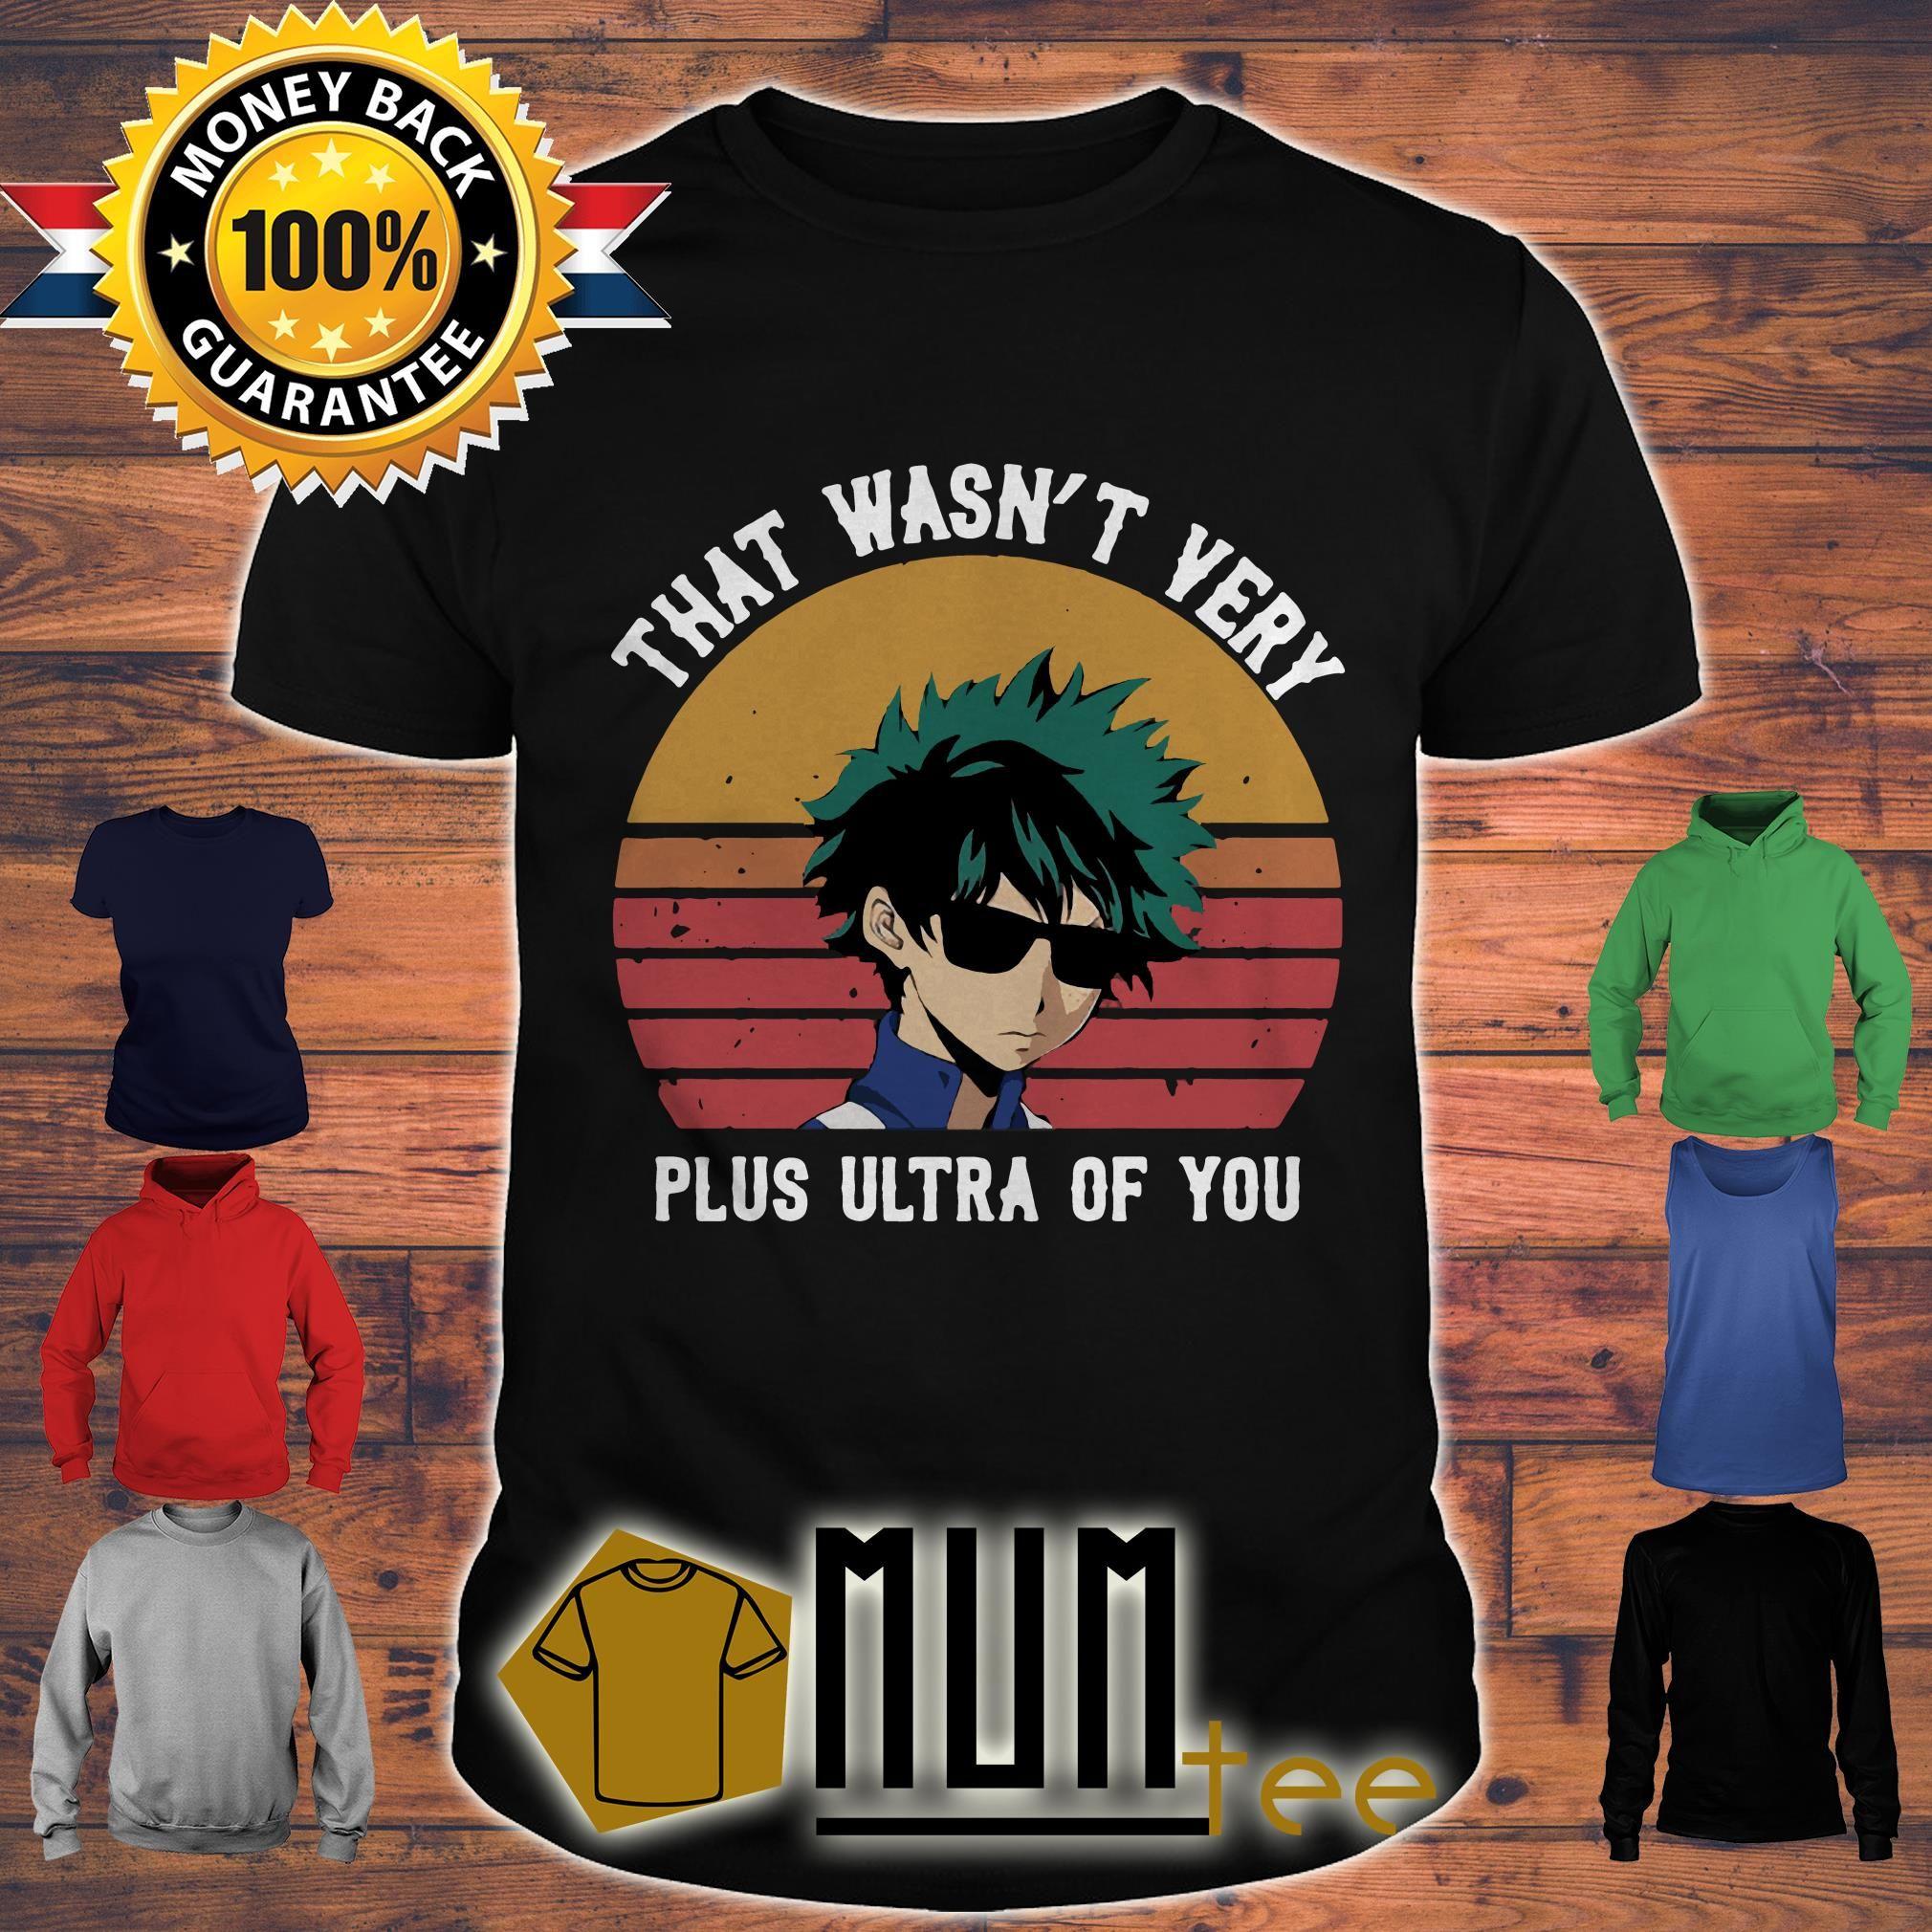 0a9528676894 Izuku Midoriya That Wasn't Very Plus Ultra Of You Shirt | MUMtee Pin ...